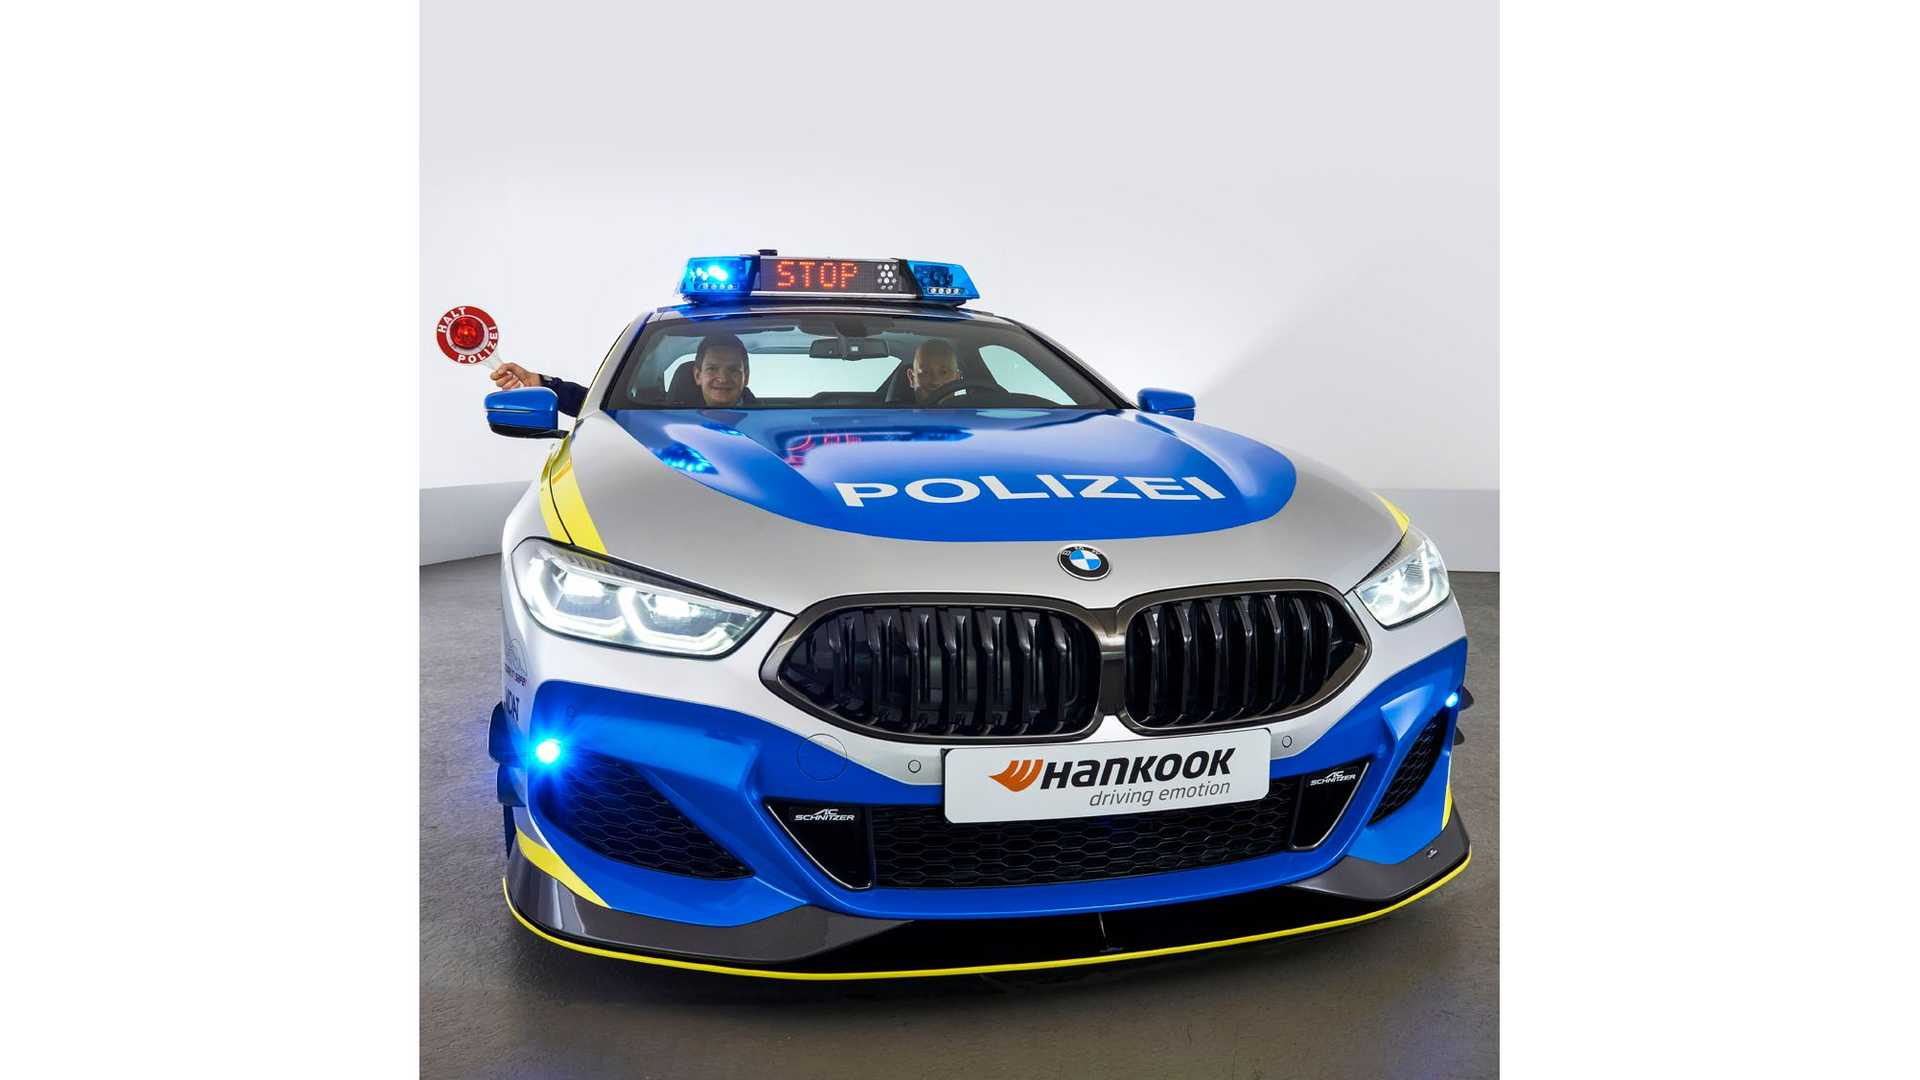 BMW-M850i-police-car-tune-it-safe-21